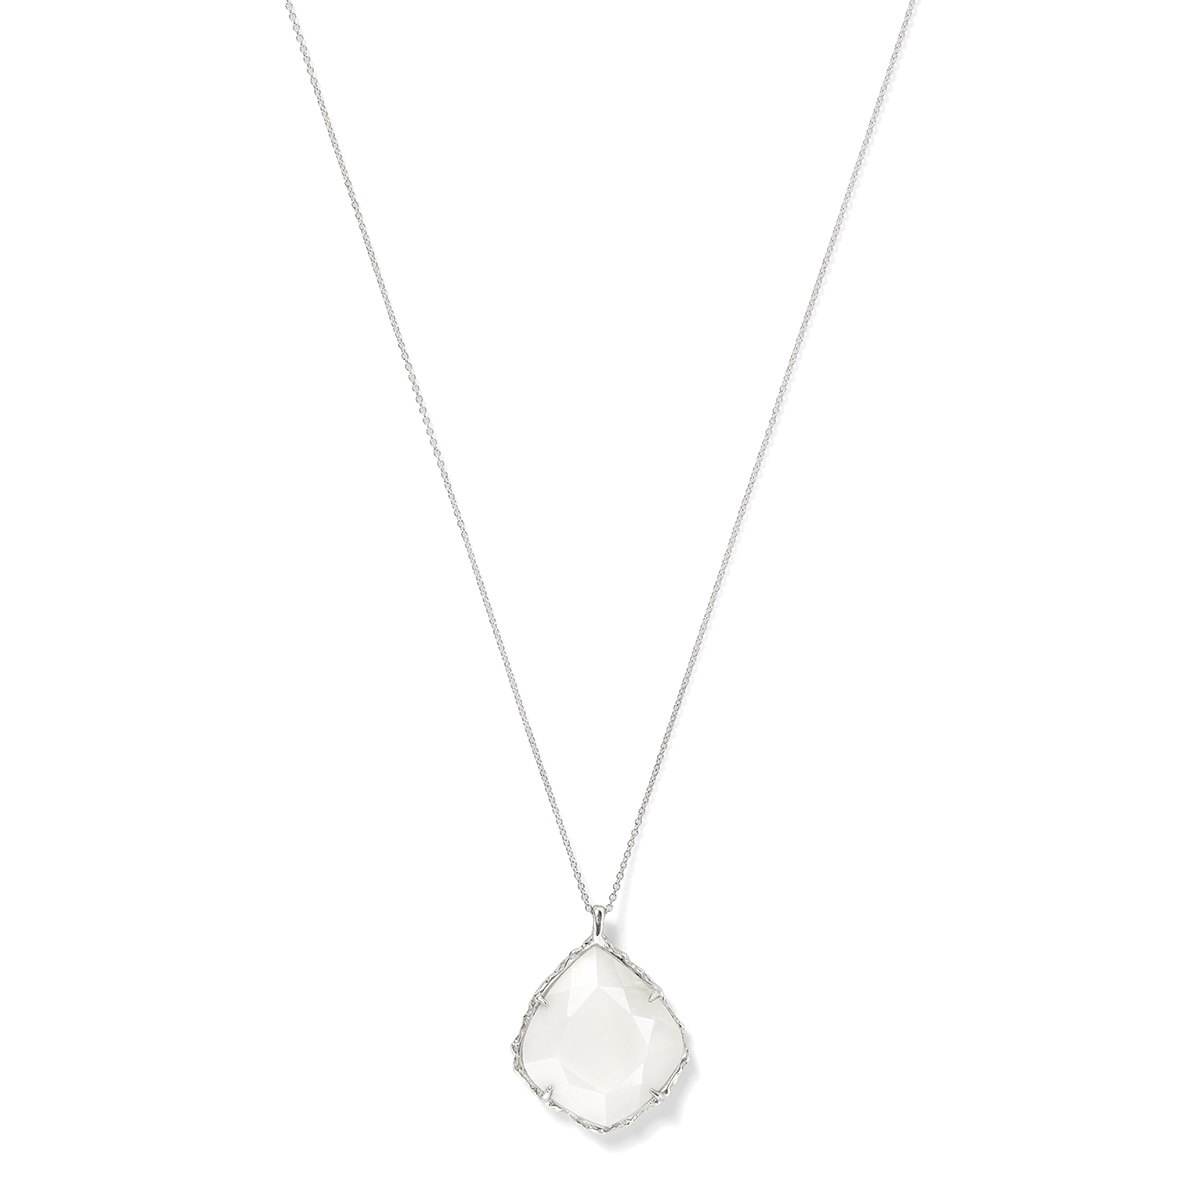 Taryn-Toomey-Airlume-Trapezoid-White-Peruvian-Opal-Necklace.jpg